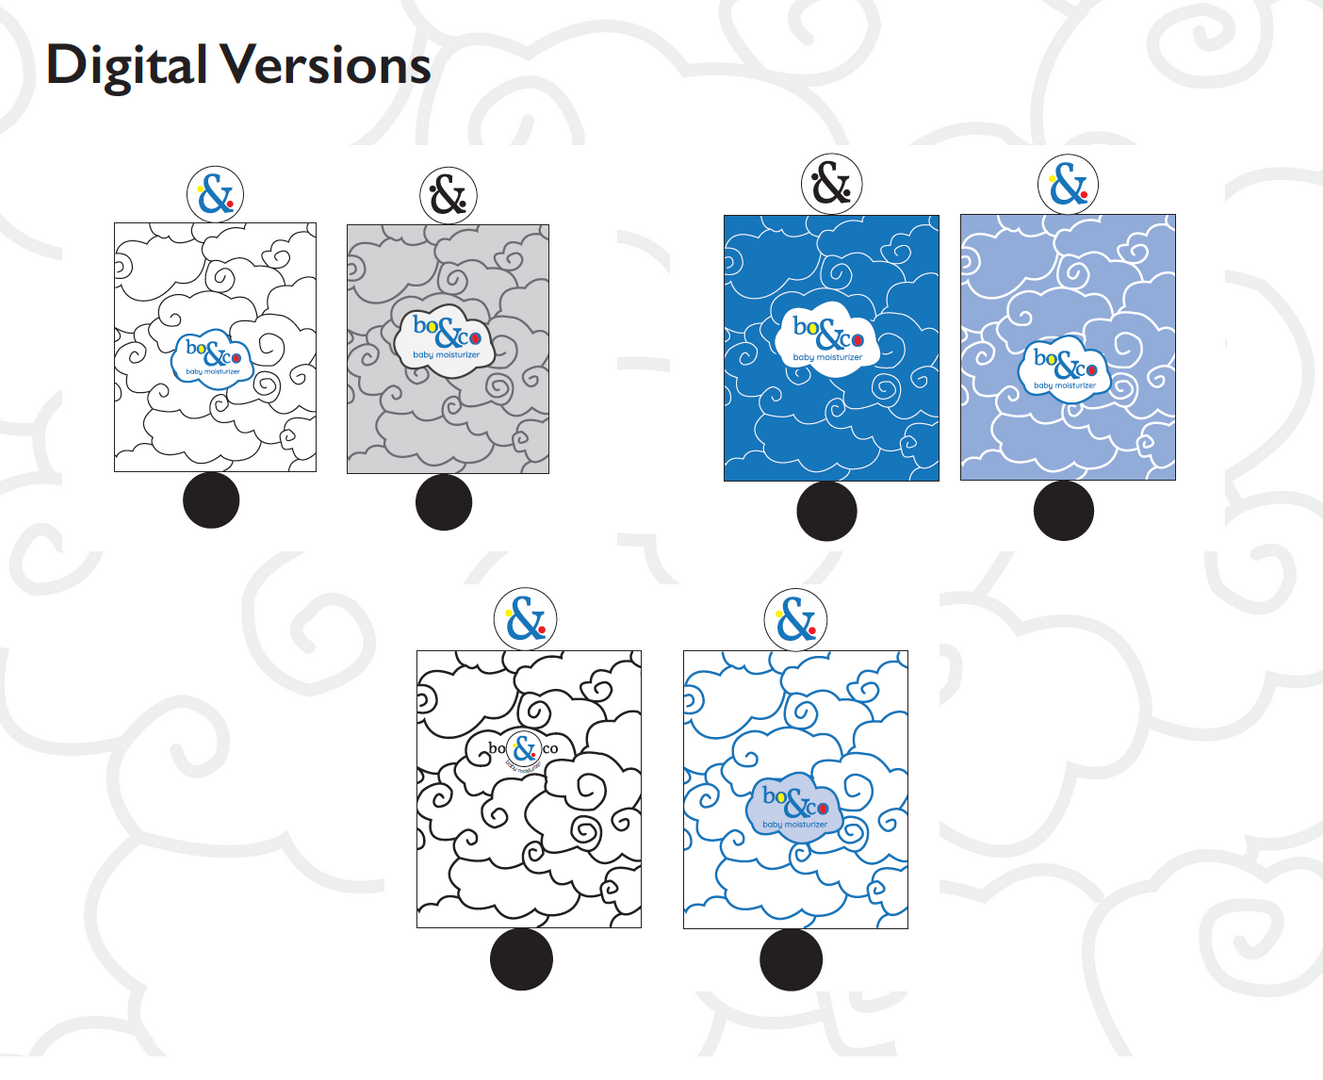 Digital versions